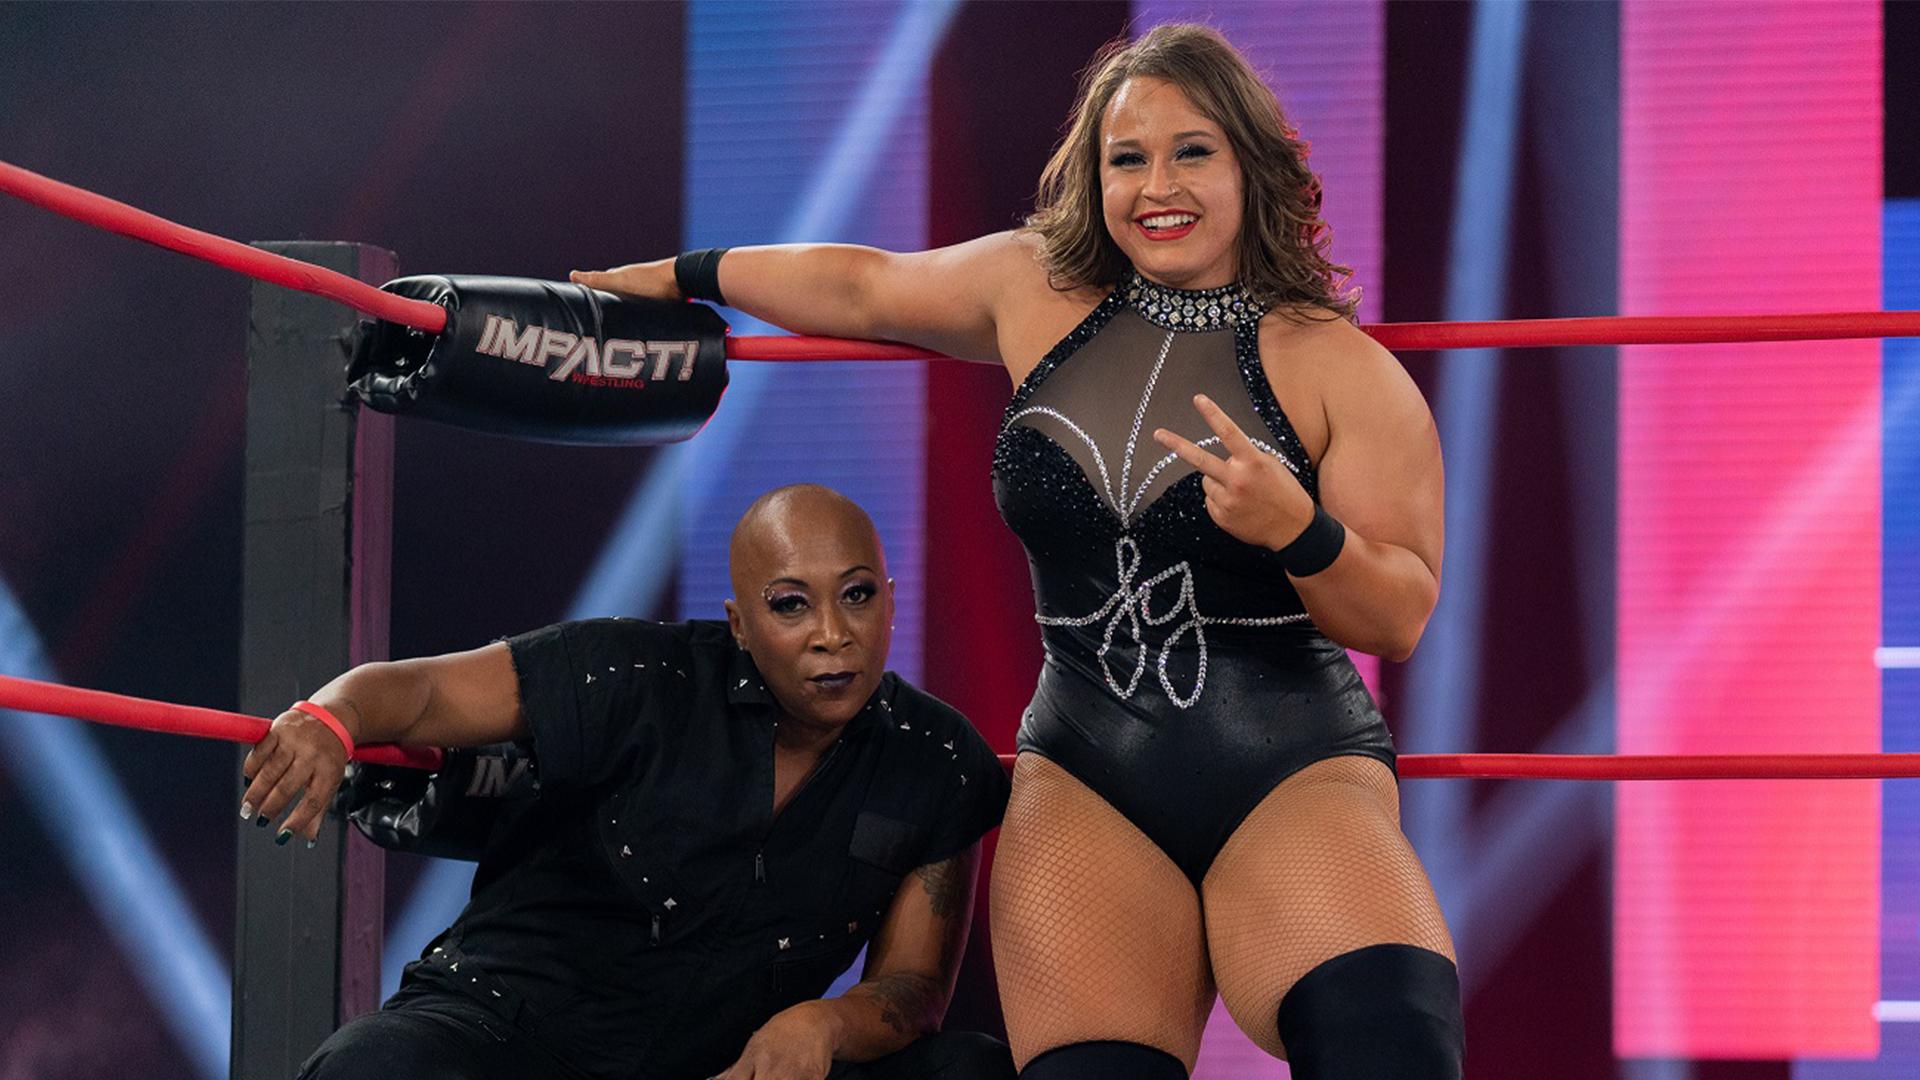 Jazz e Jordynne Grace avançam no torneio do IMPACT Knockouts Tag Team Championship